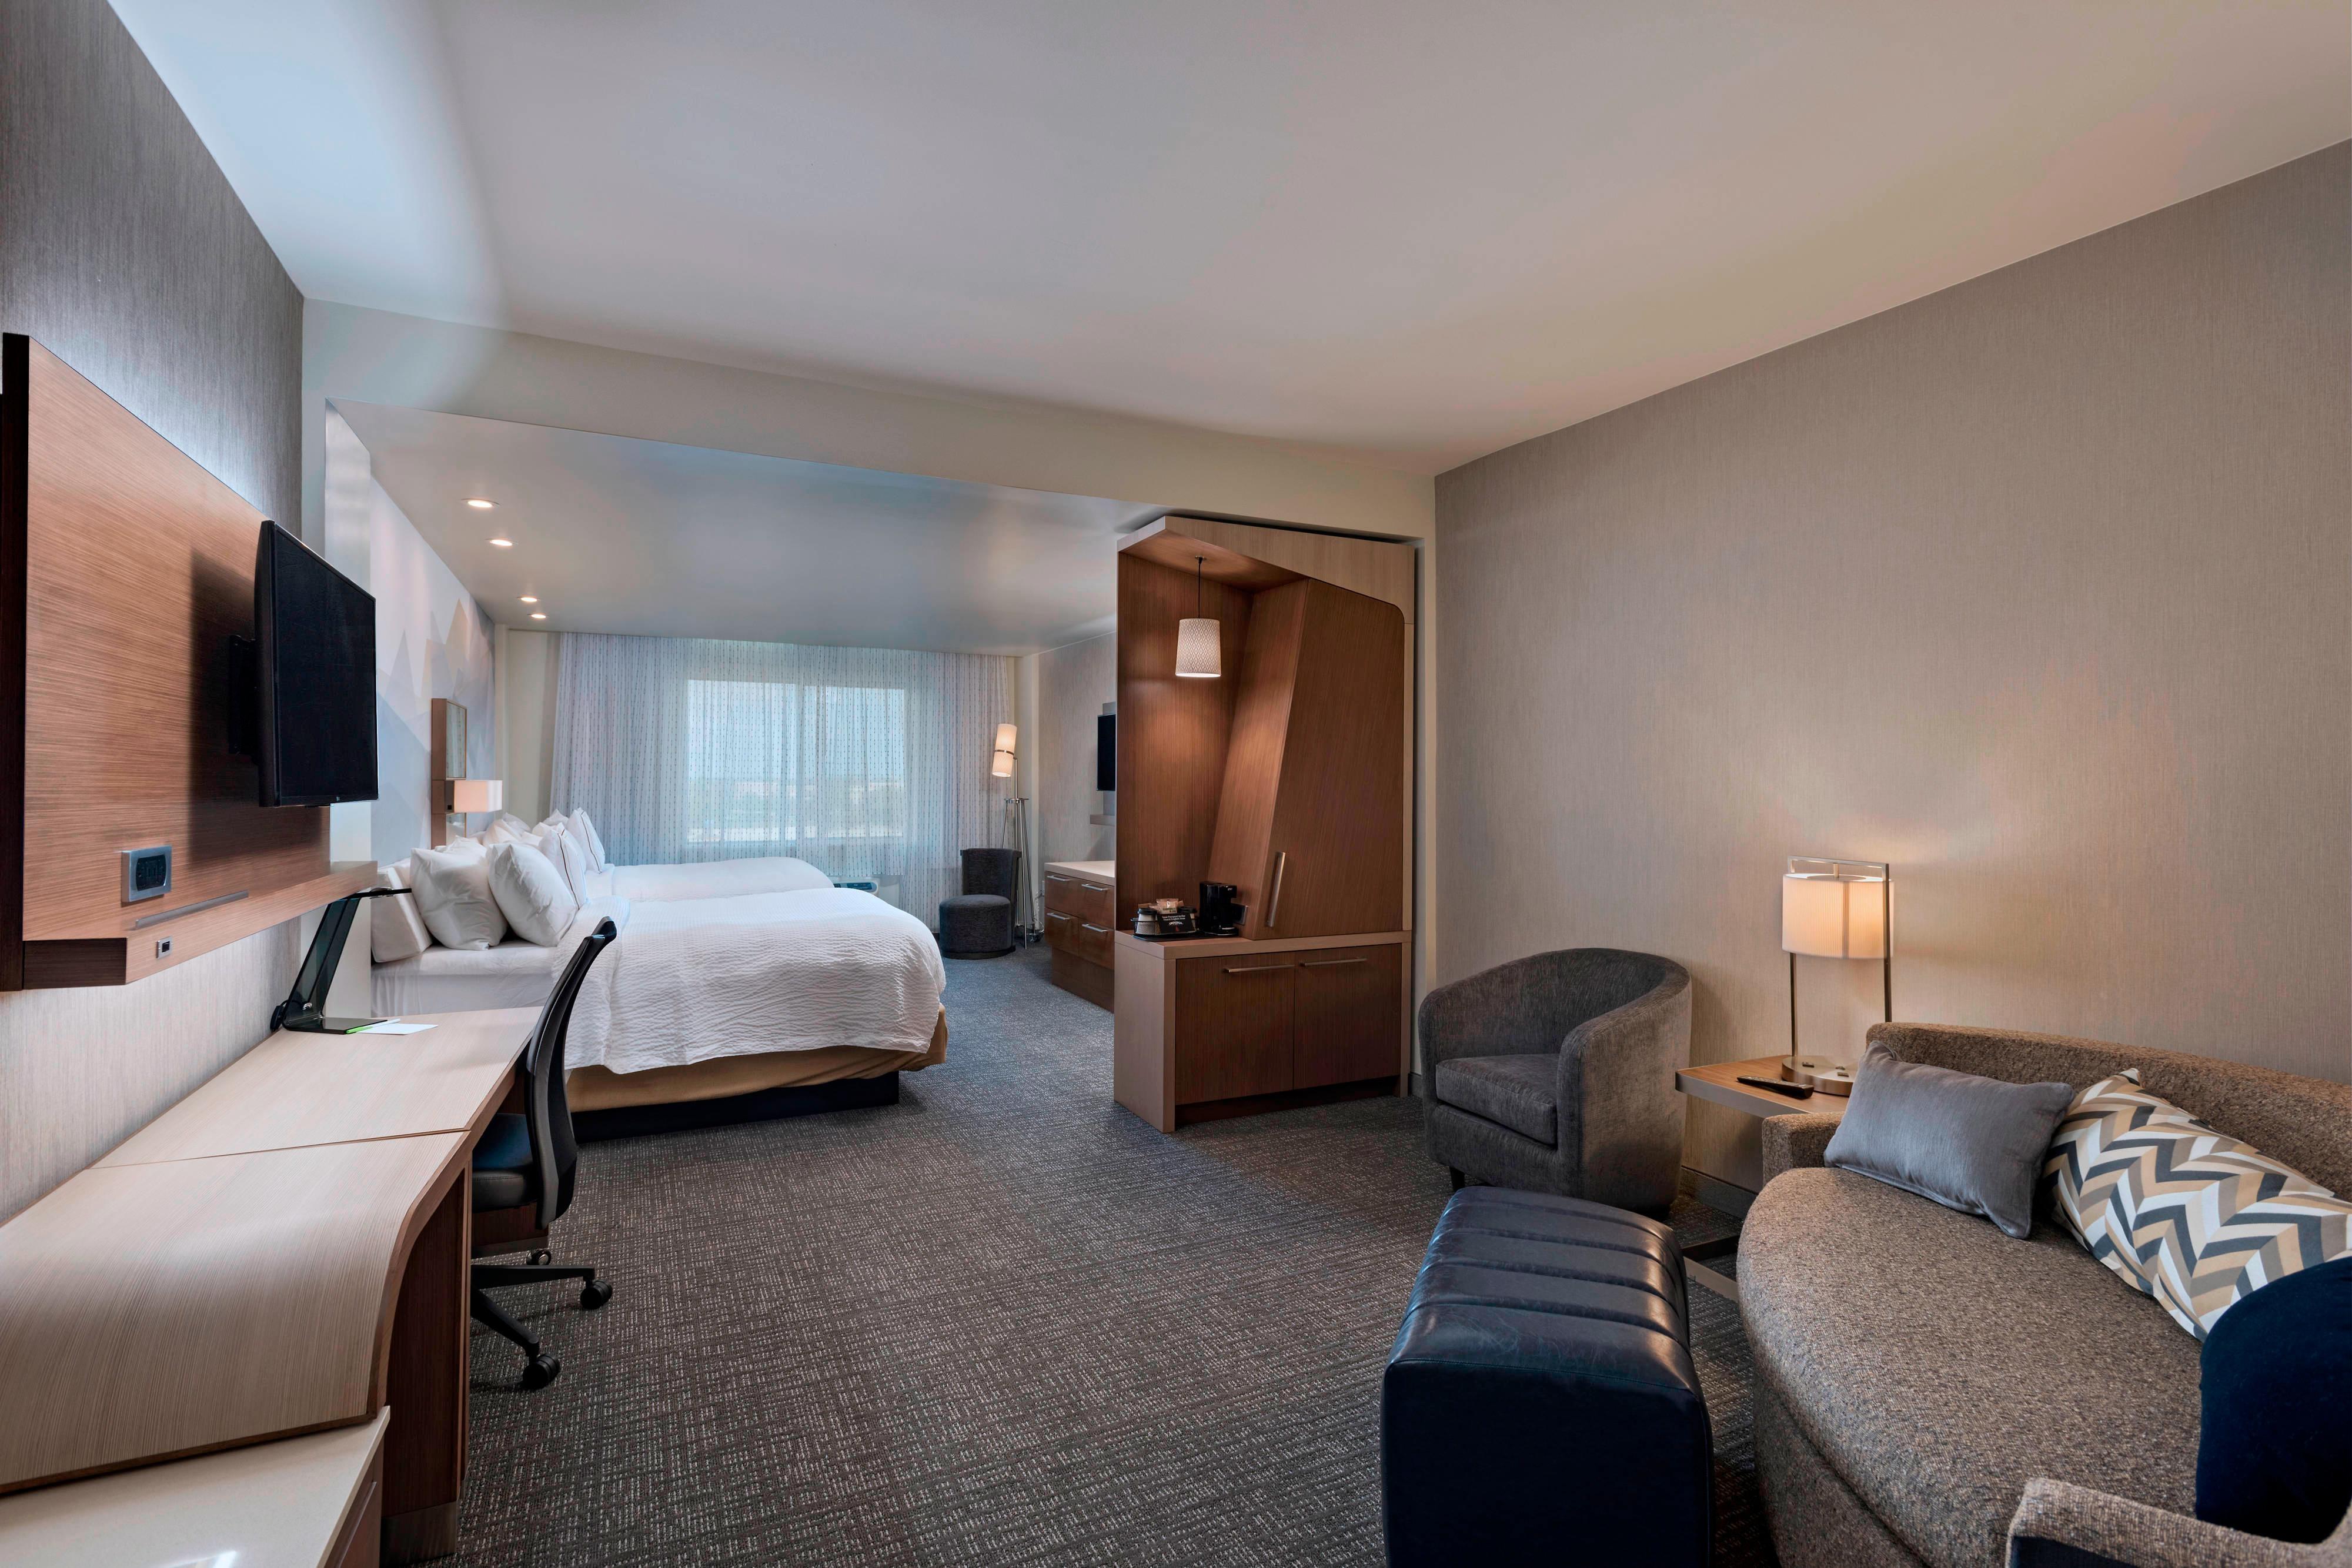 chair king sugar land adult beanbag courtyard houston lake pointe hotel amenities